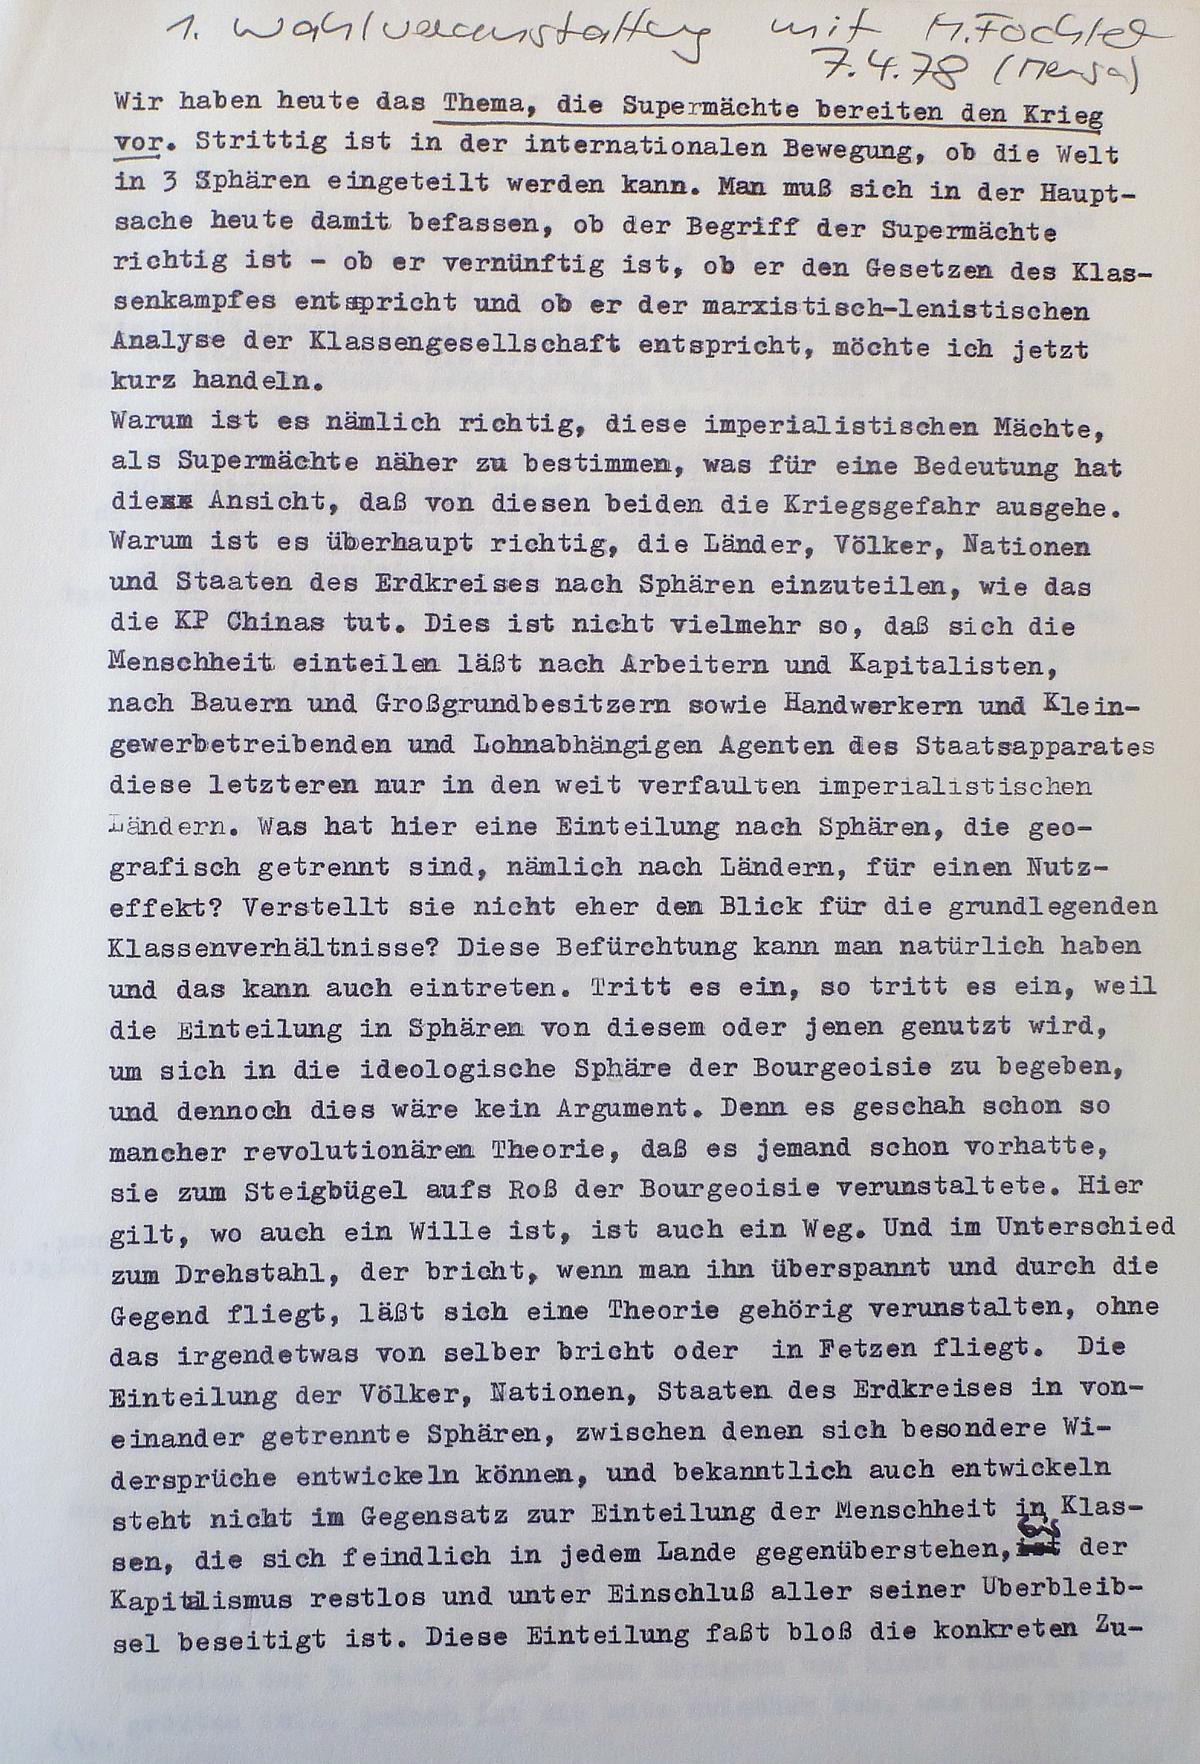 Hamburg_KBW_1978_Fochler001